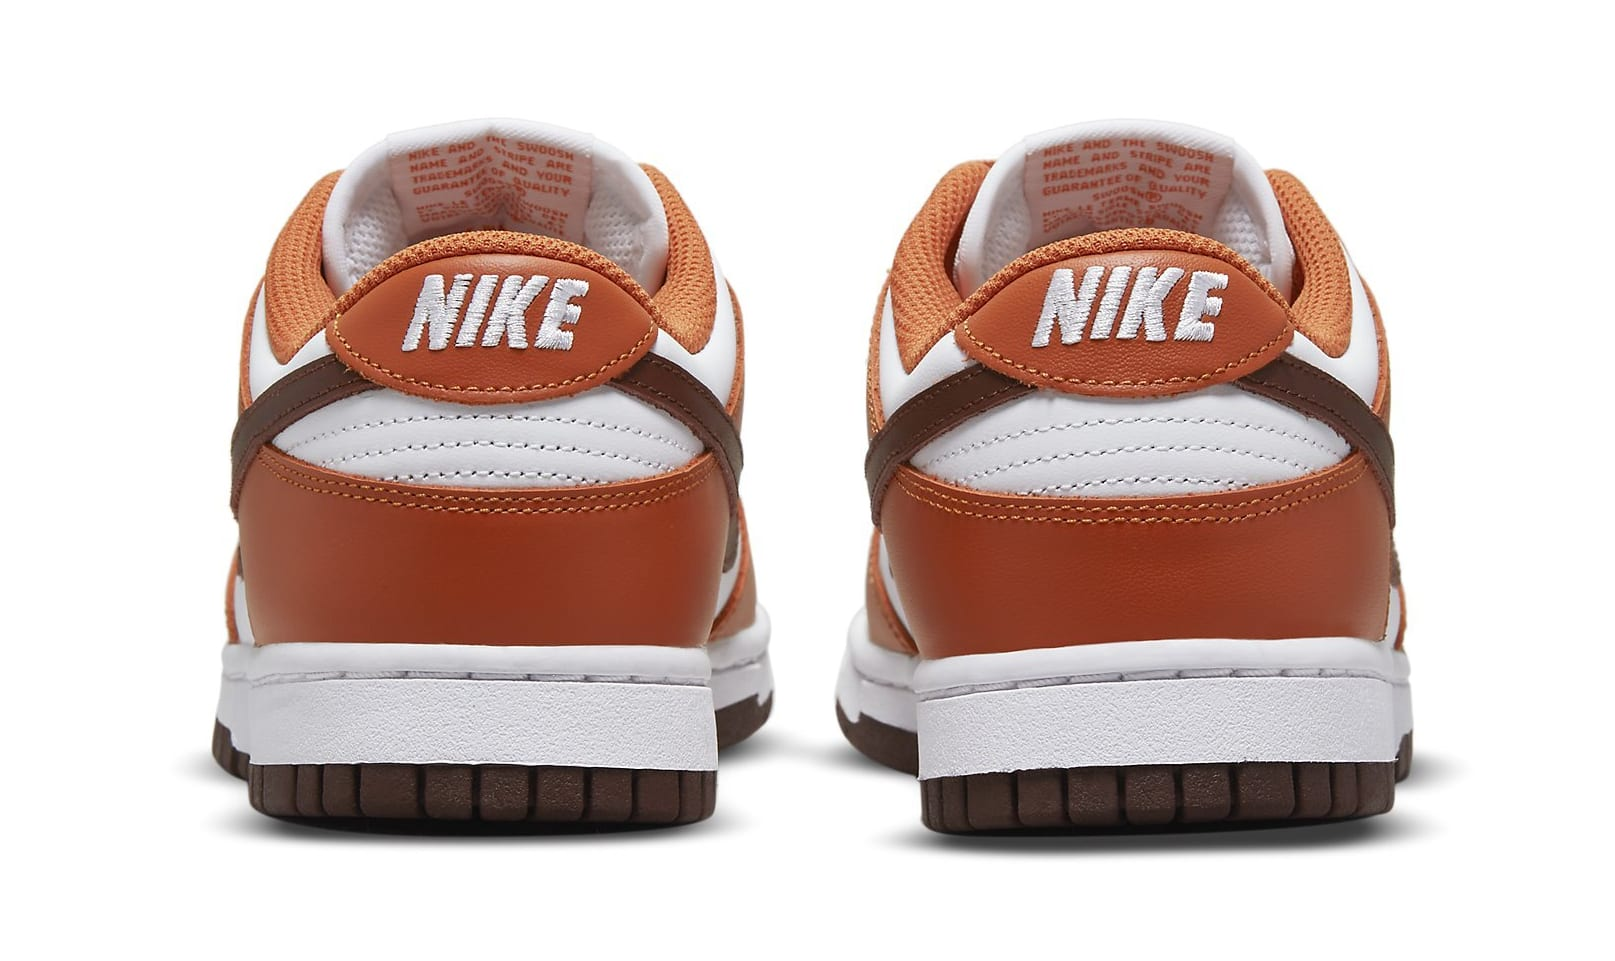 Nike Dunk Low DQ4697-800 Heel